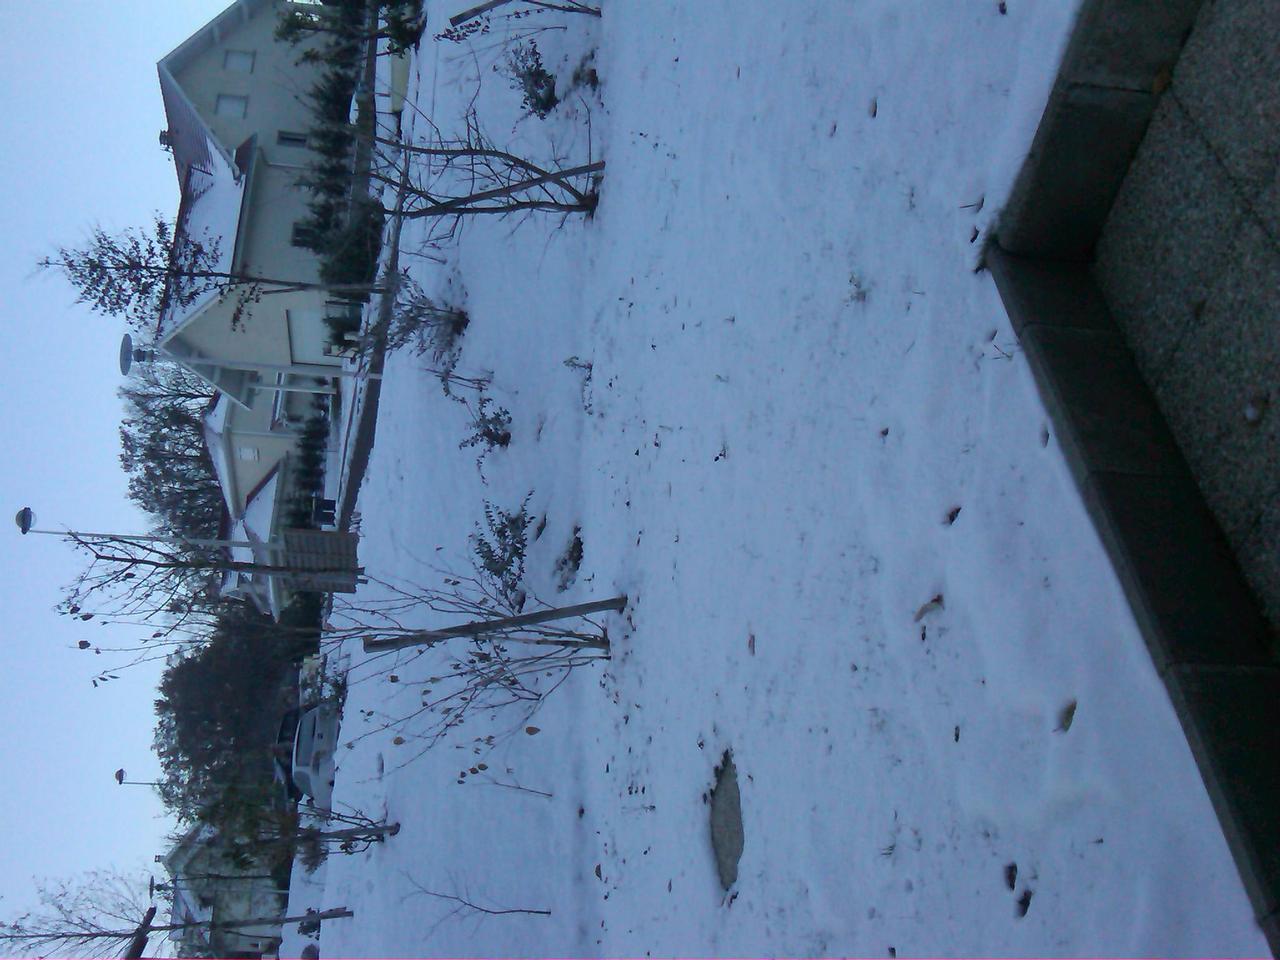 Nowcasting Vieugy-Annecy Alta Savoia - Alpi Francesi-img00553-20131203-0923.jpg